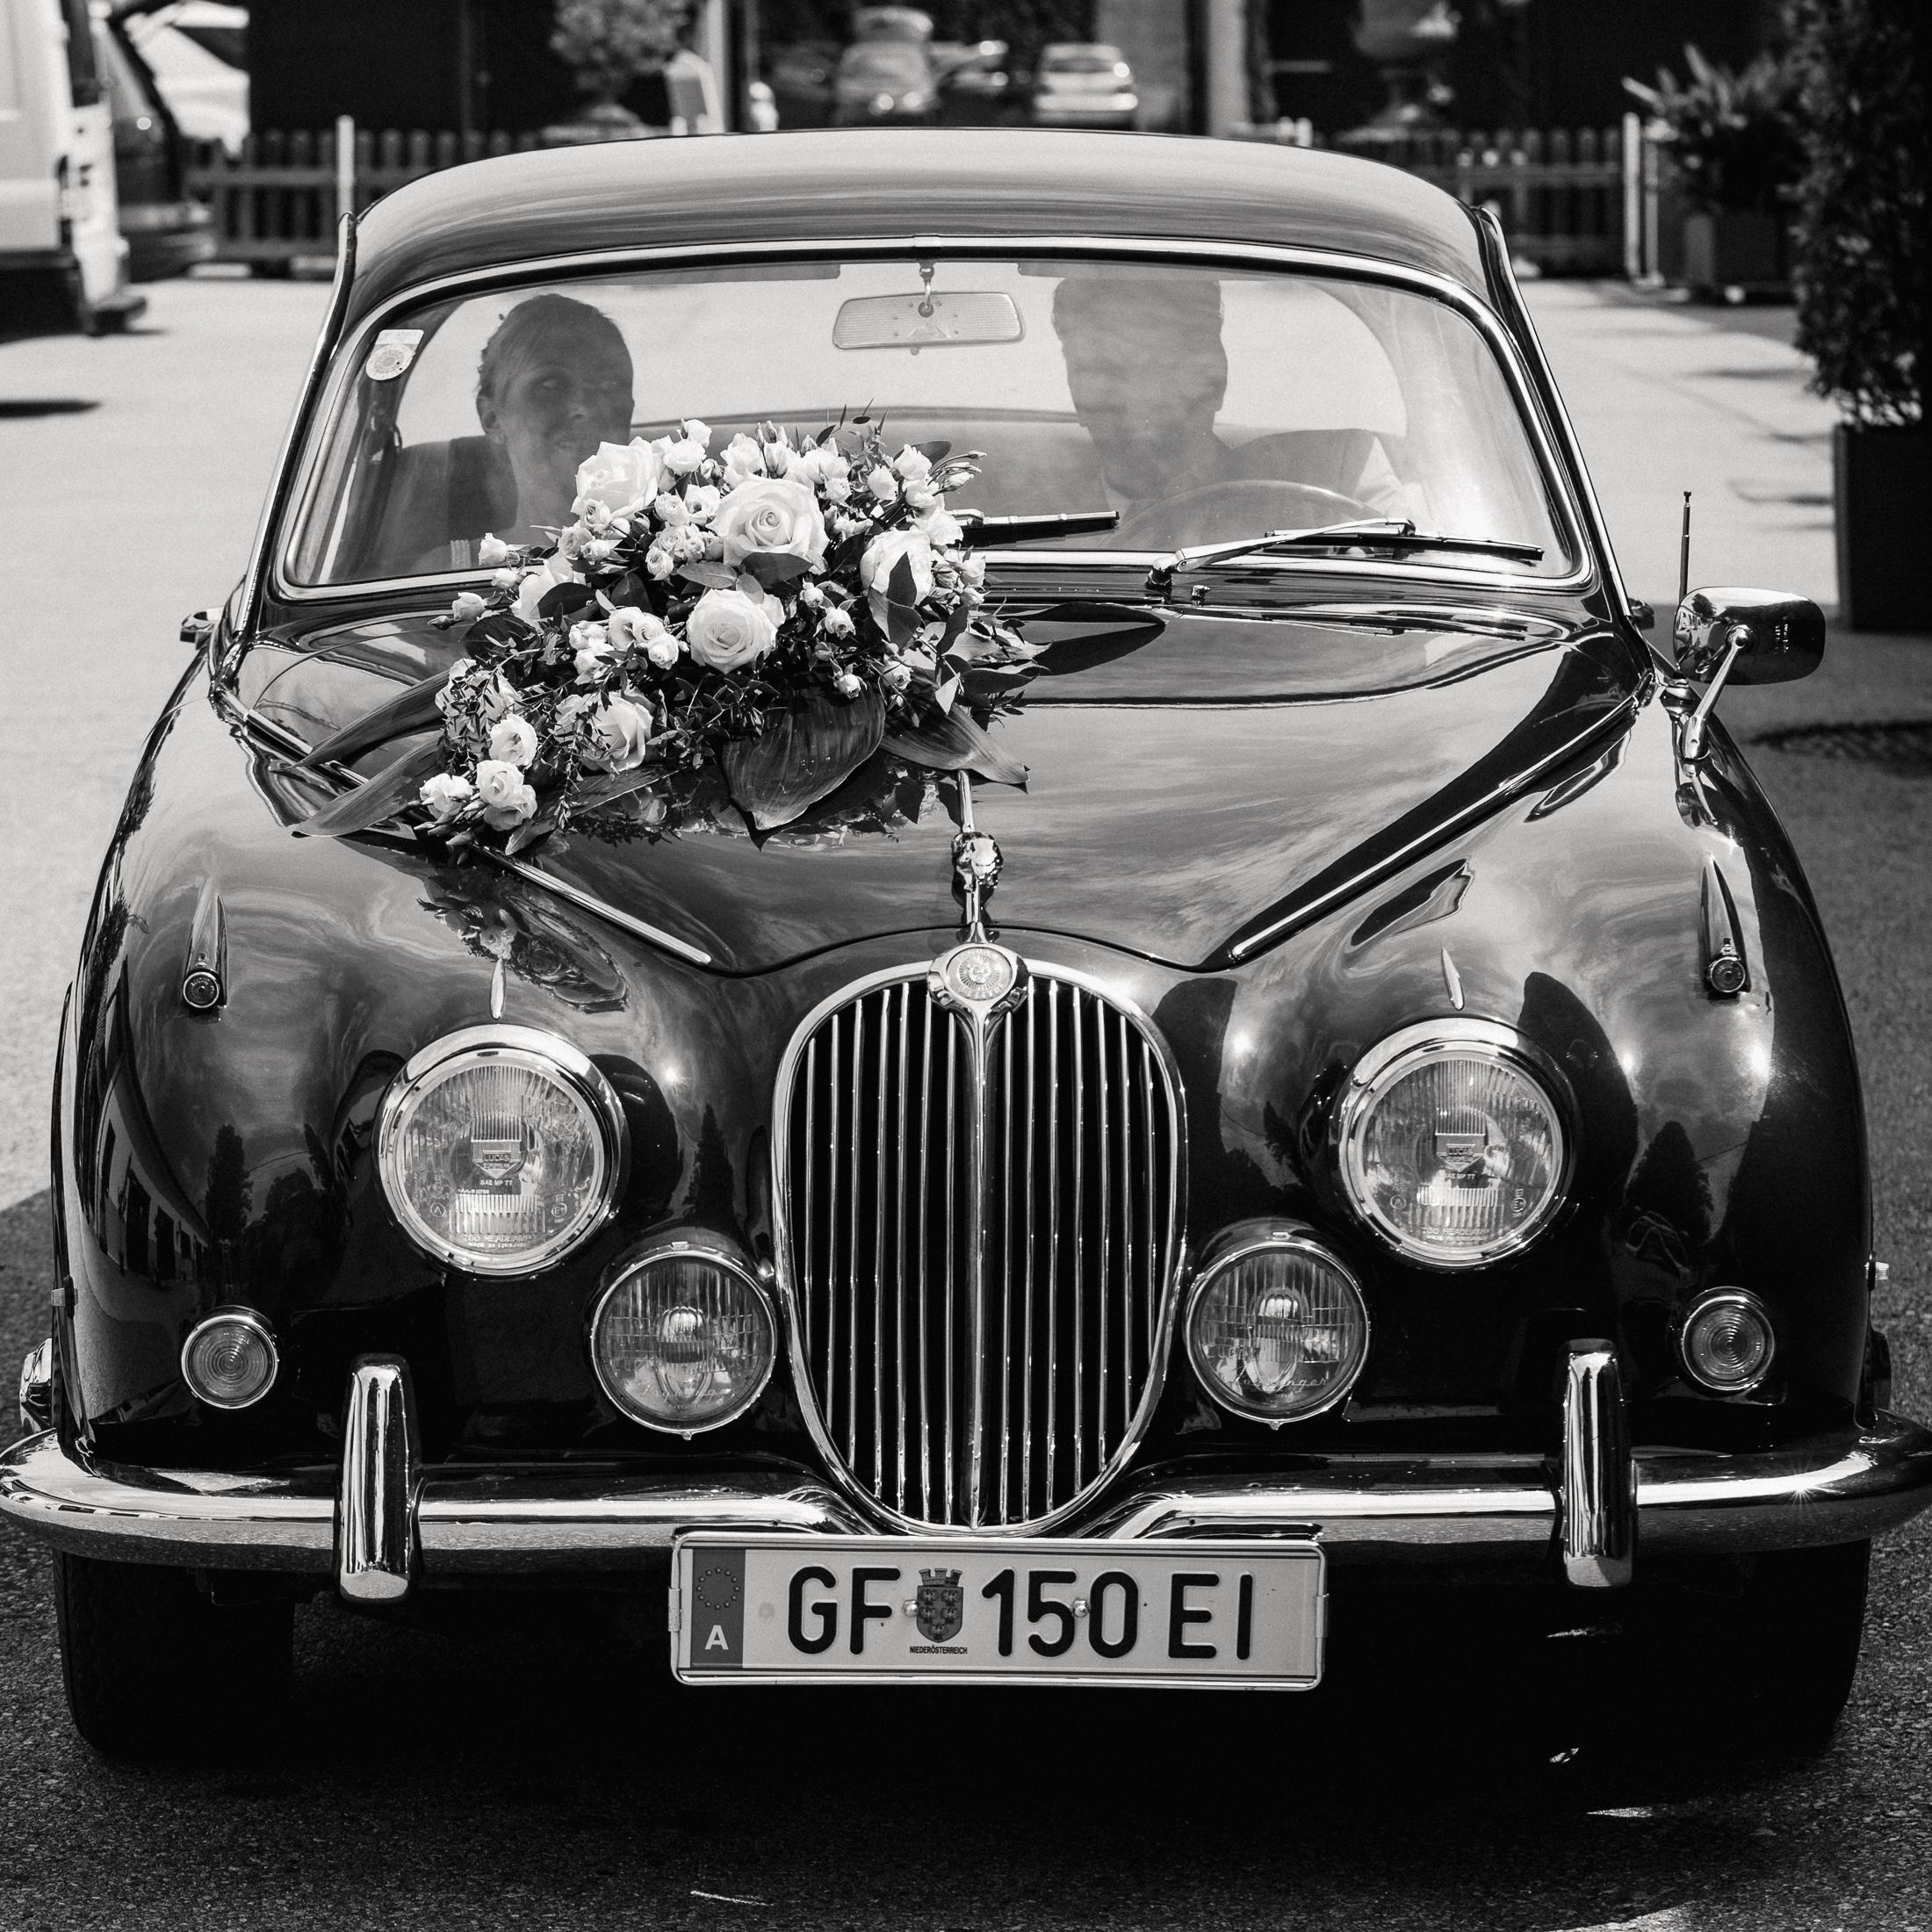 SebastianDon-Hochzeitsfotograf-Wien Umgebung-3.jpg